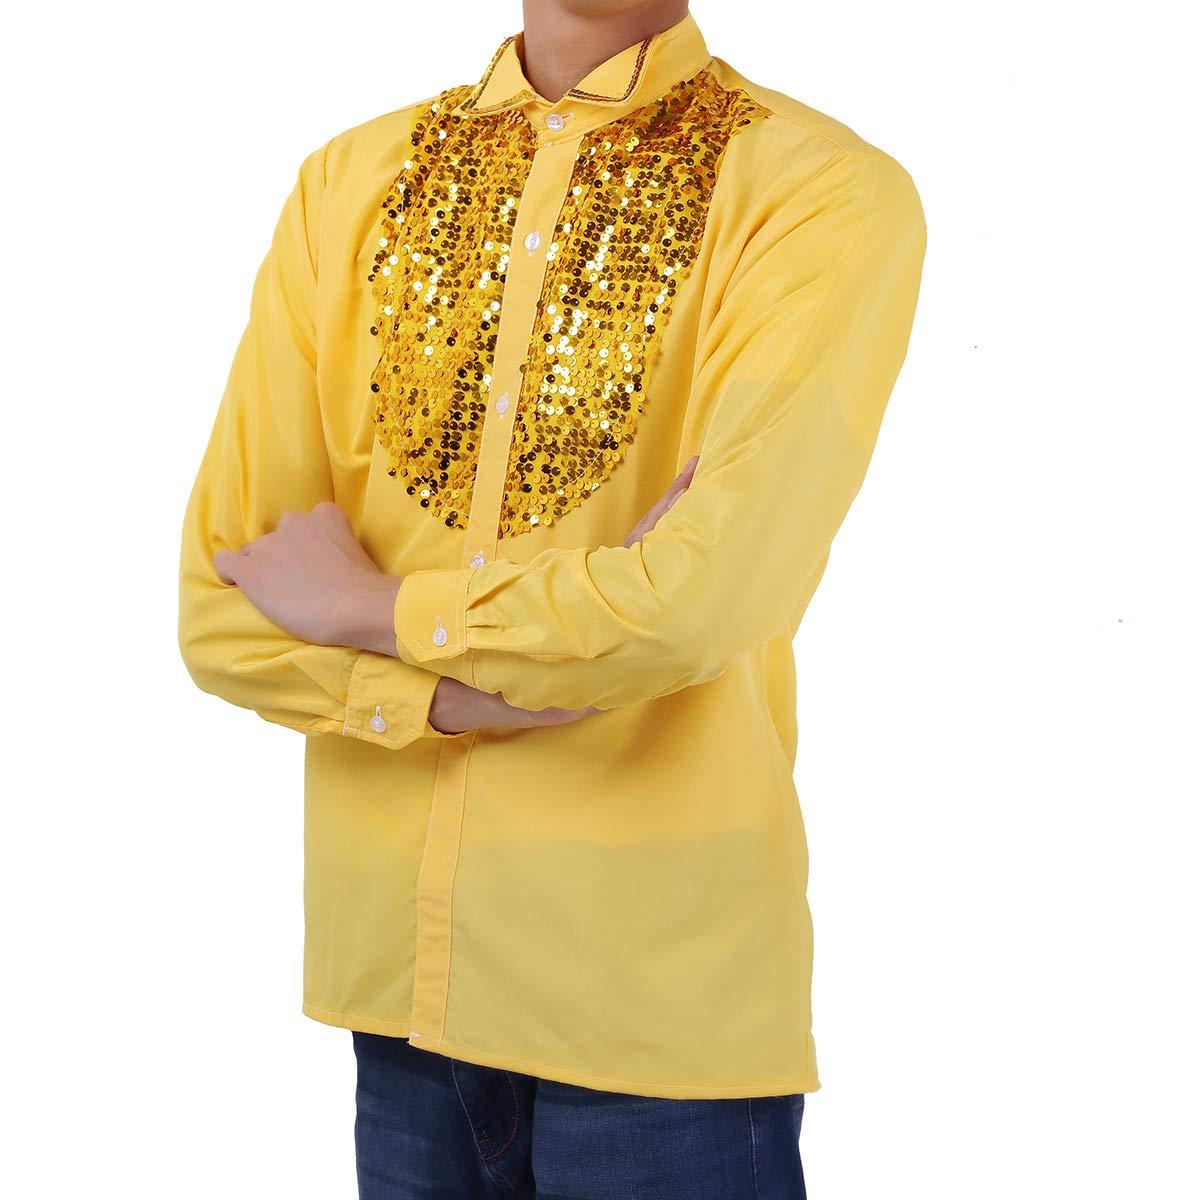 MSemis Camisa de Baile Salsa Jazz para Hombres Camisas con Lentejuelas Slim Fit Manga Larga Talla Grande M-XL